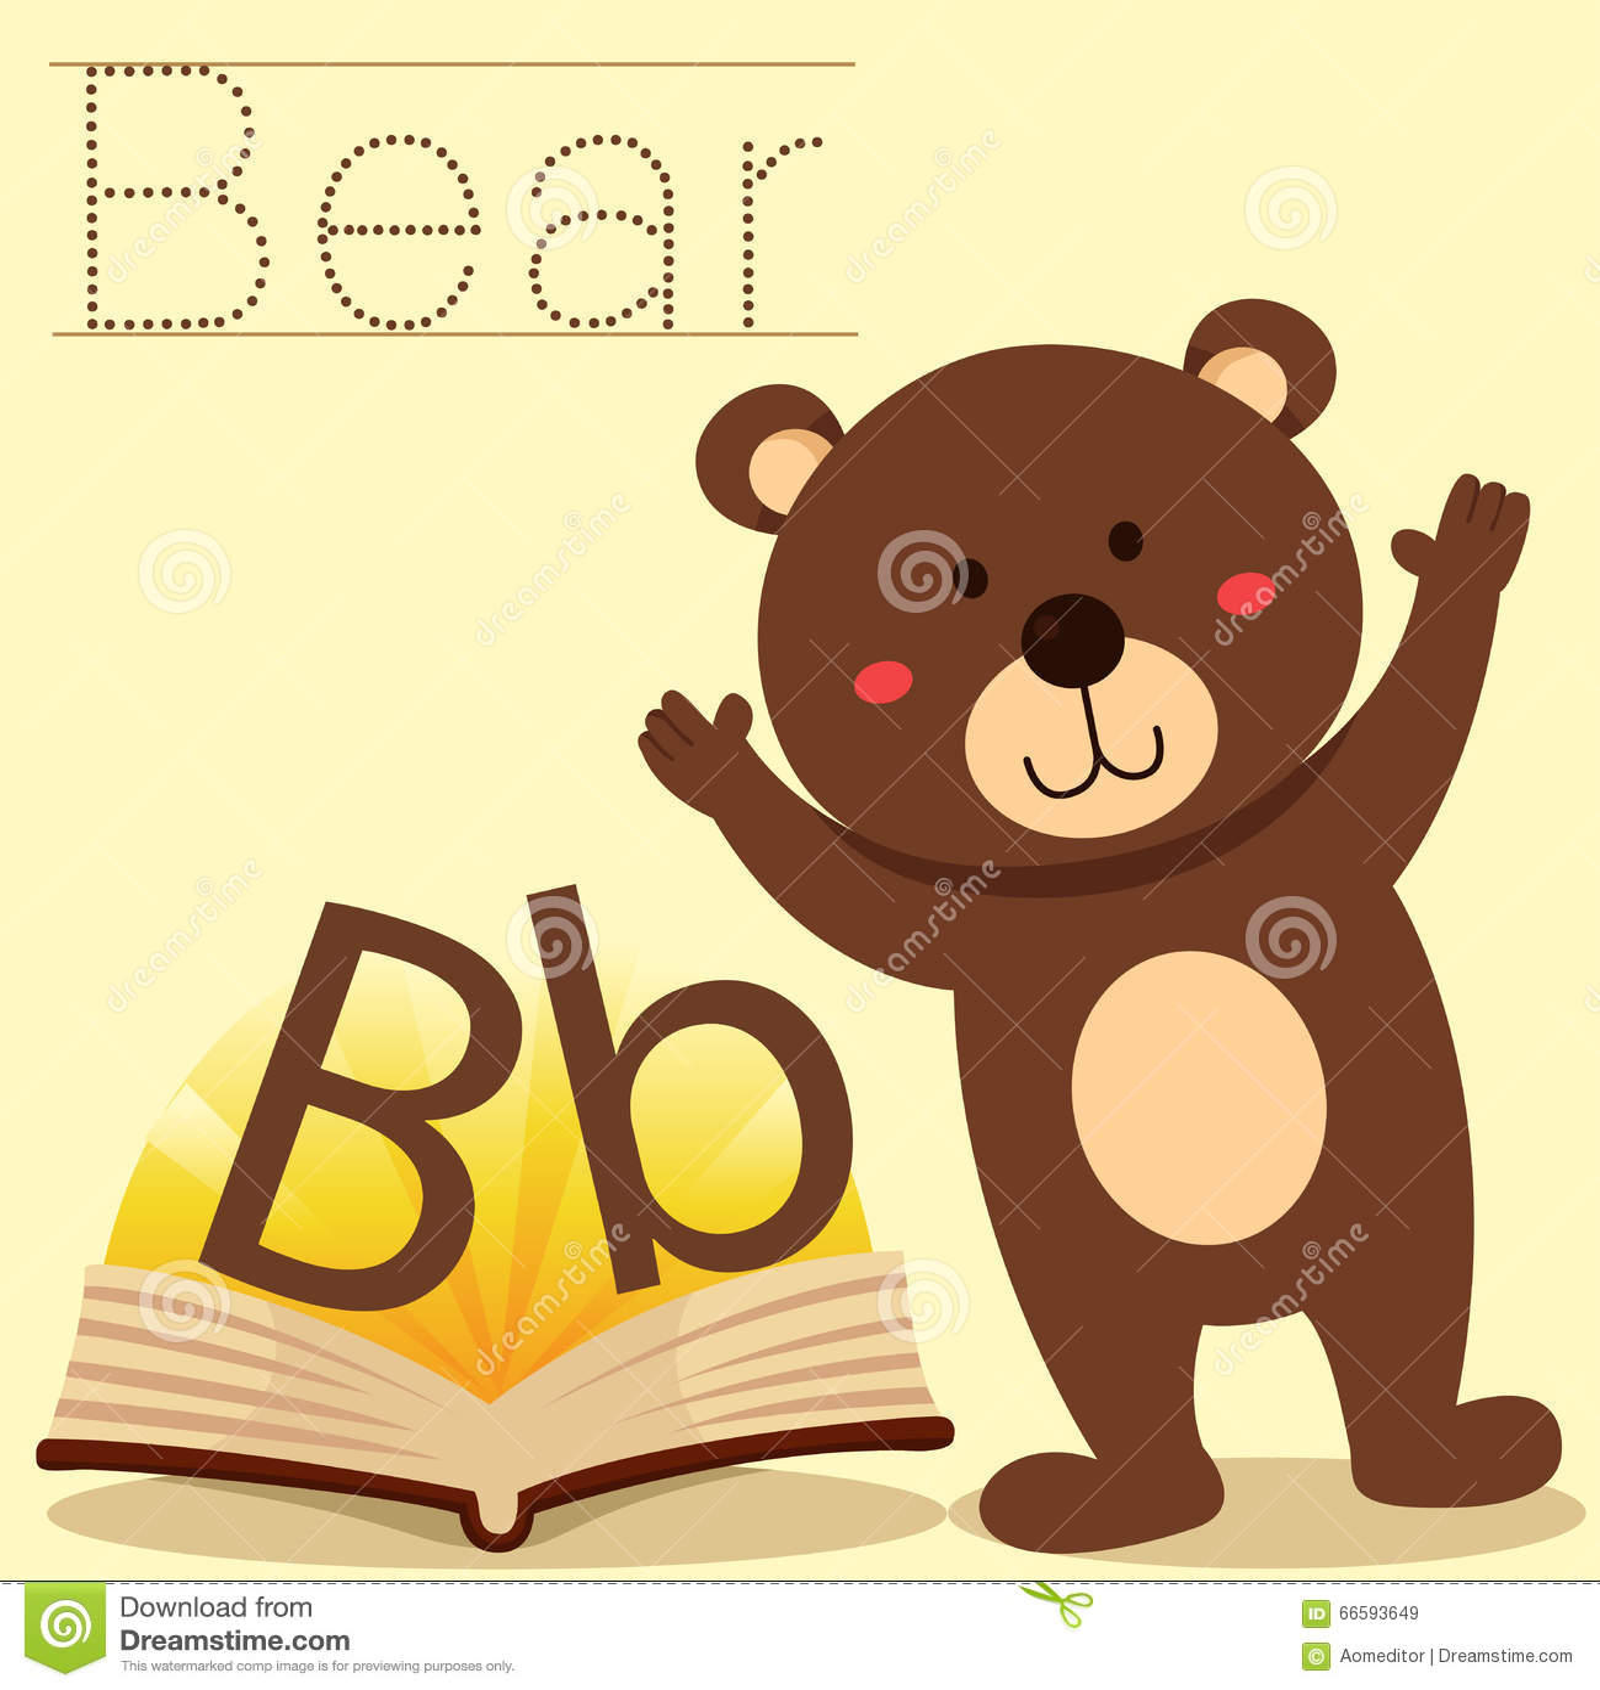 Illustrator Of B For Bear Vocabulary Stock Vector